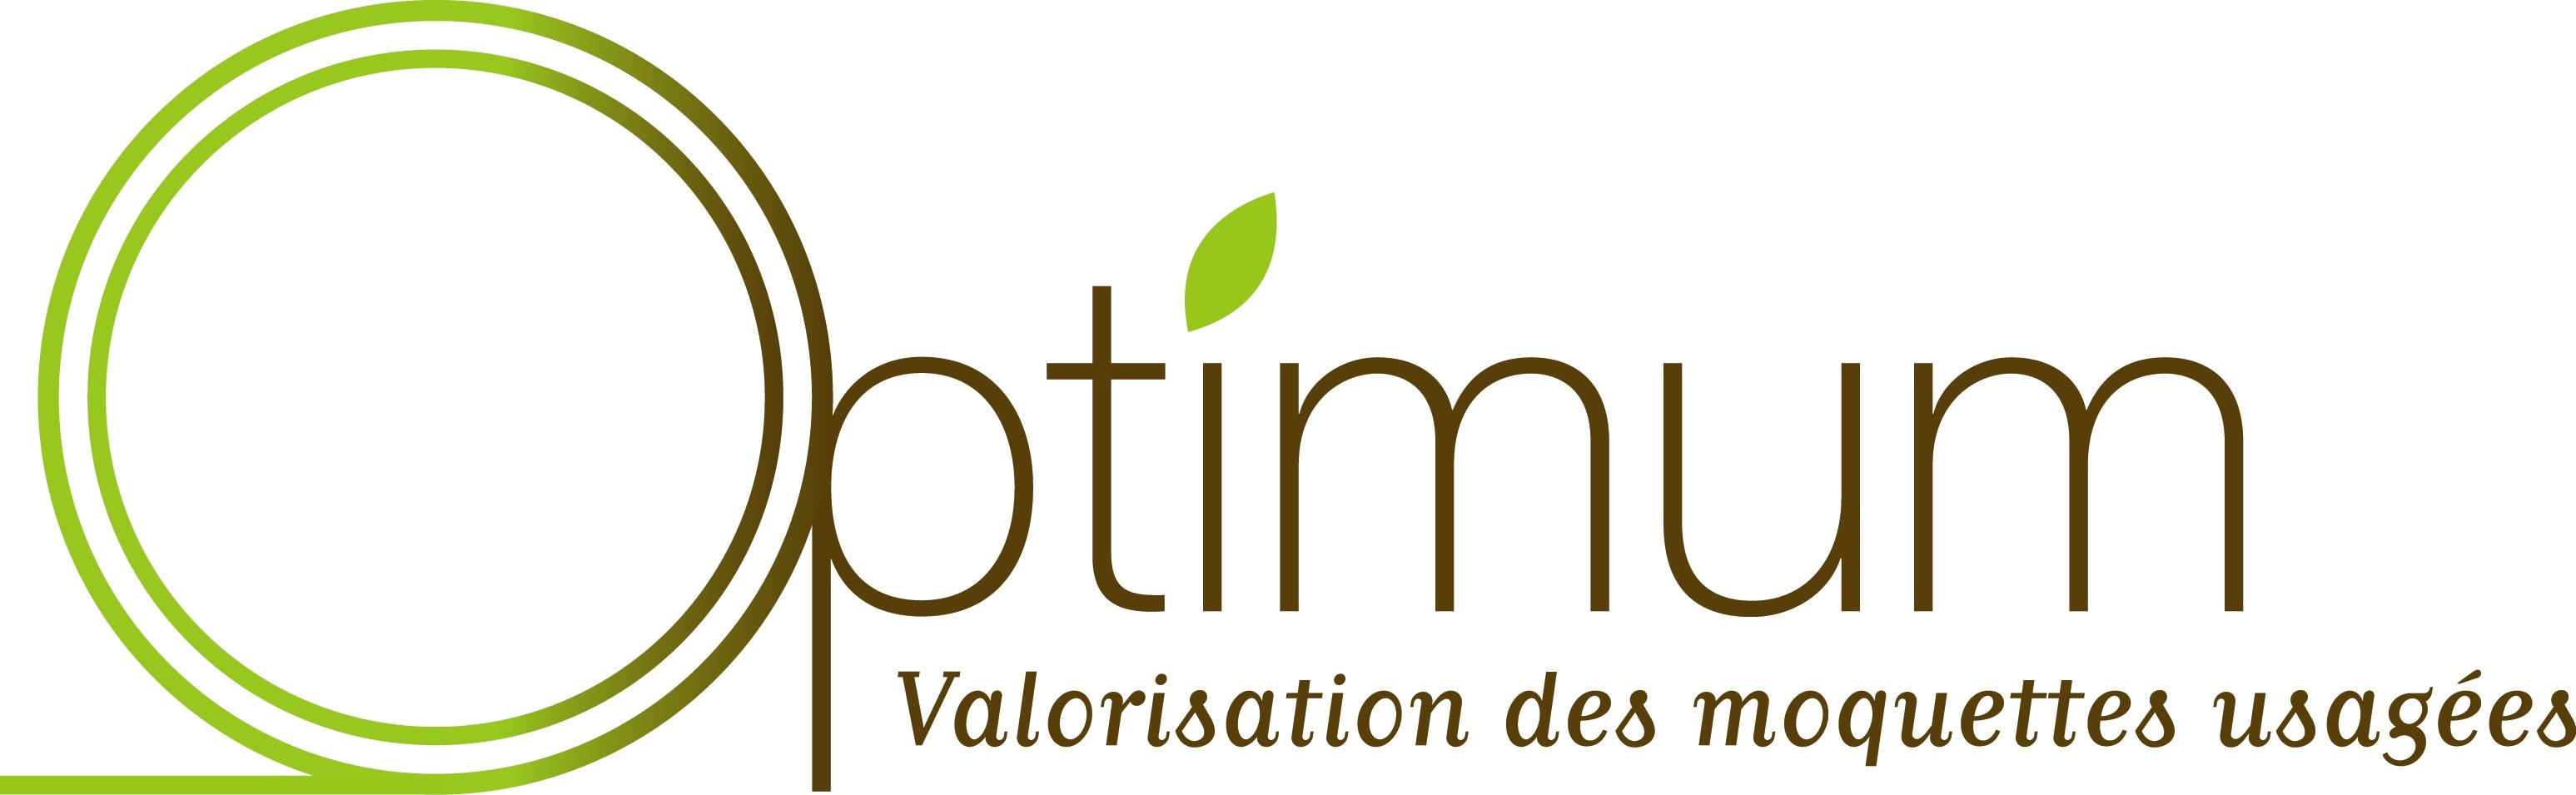 logo-optimum2-171110.jpg